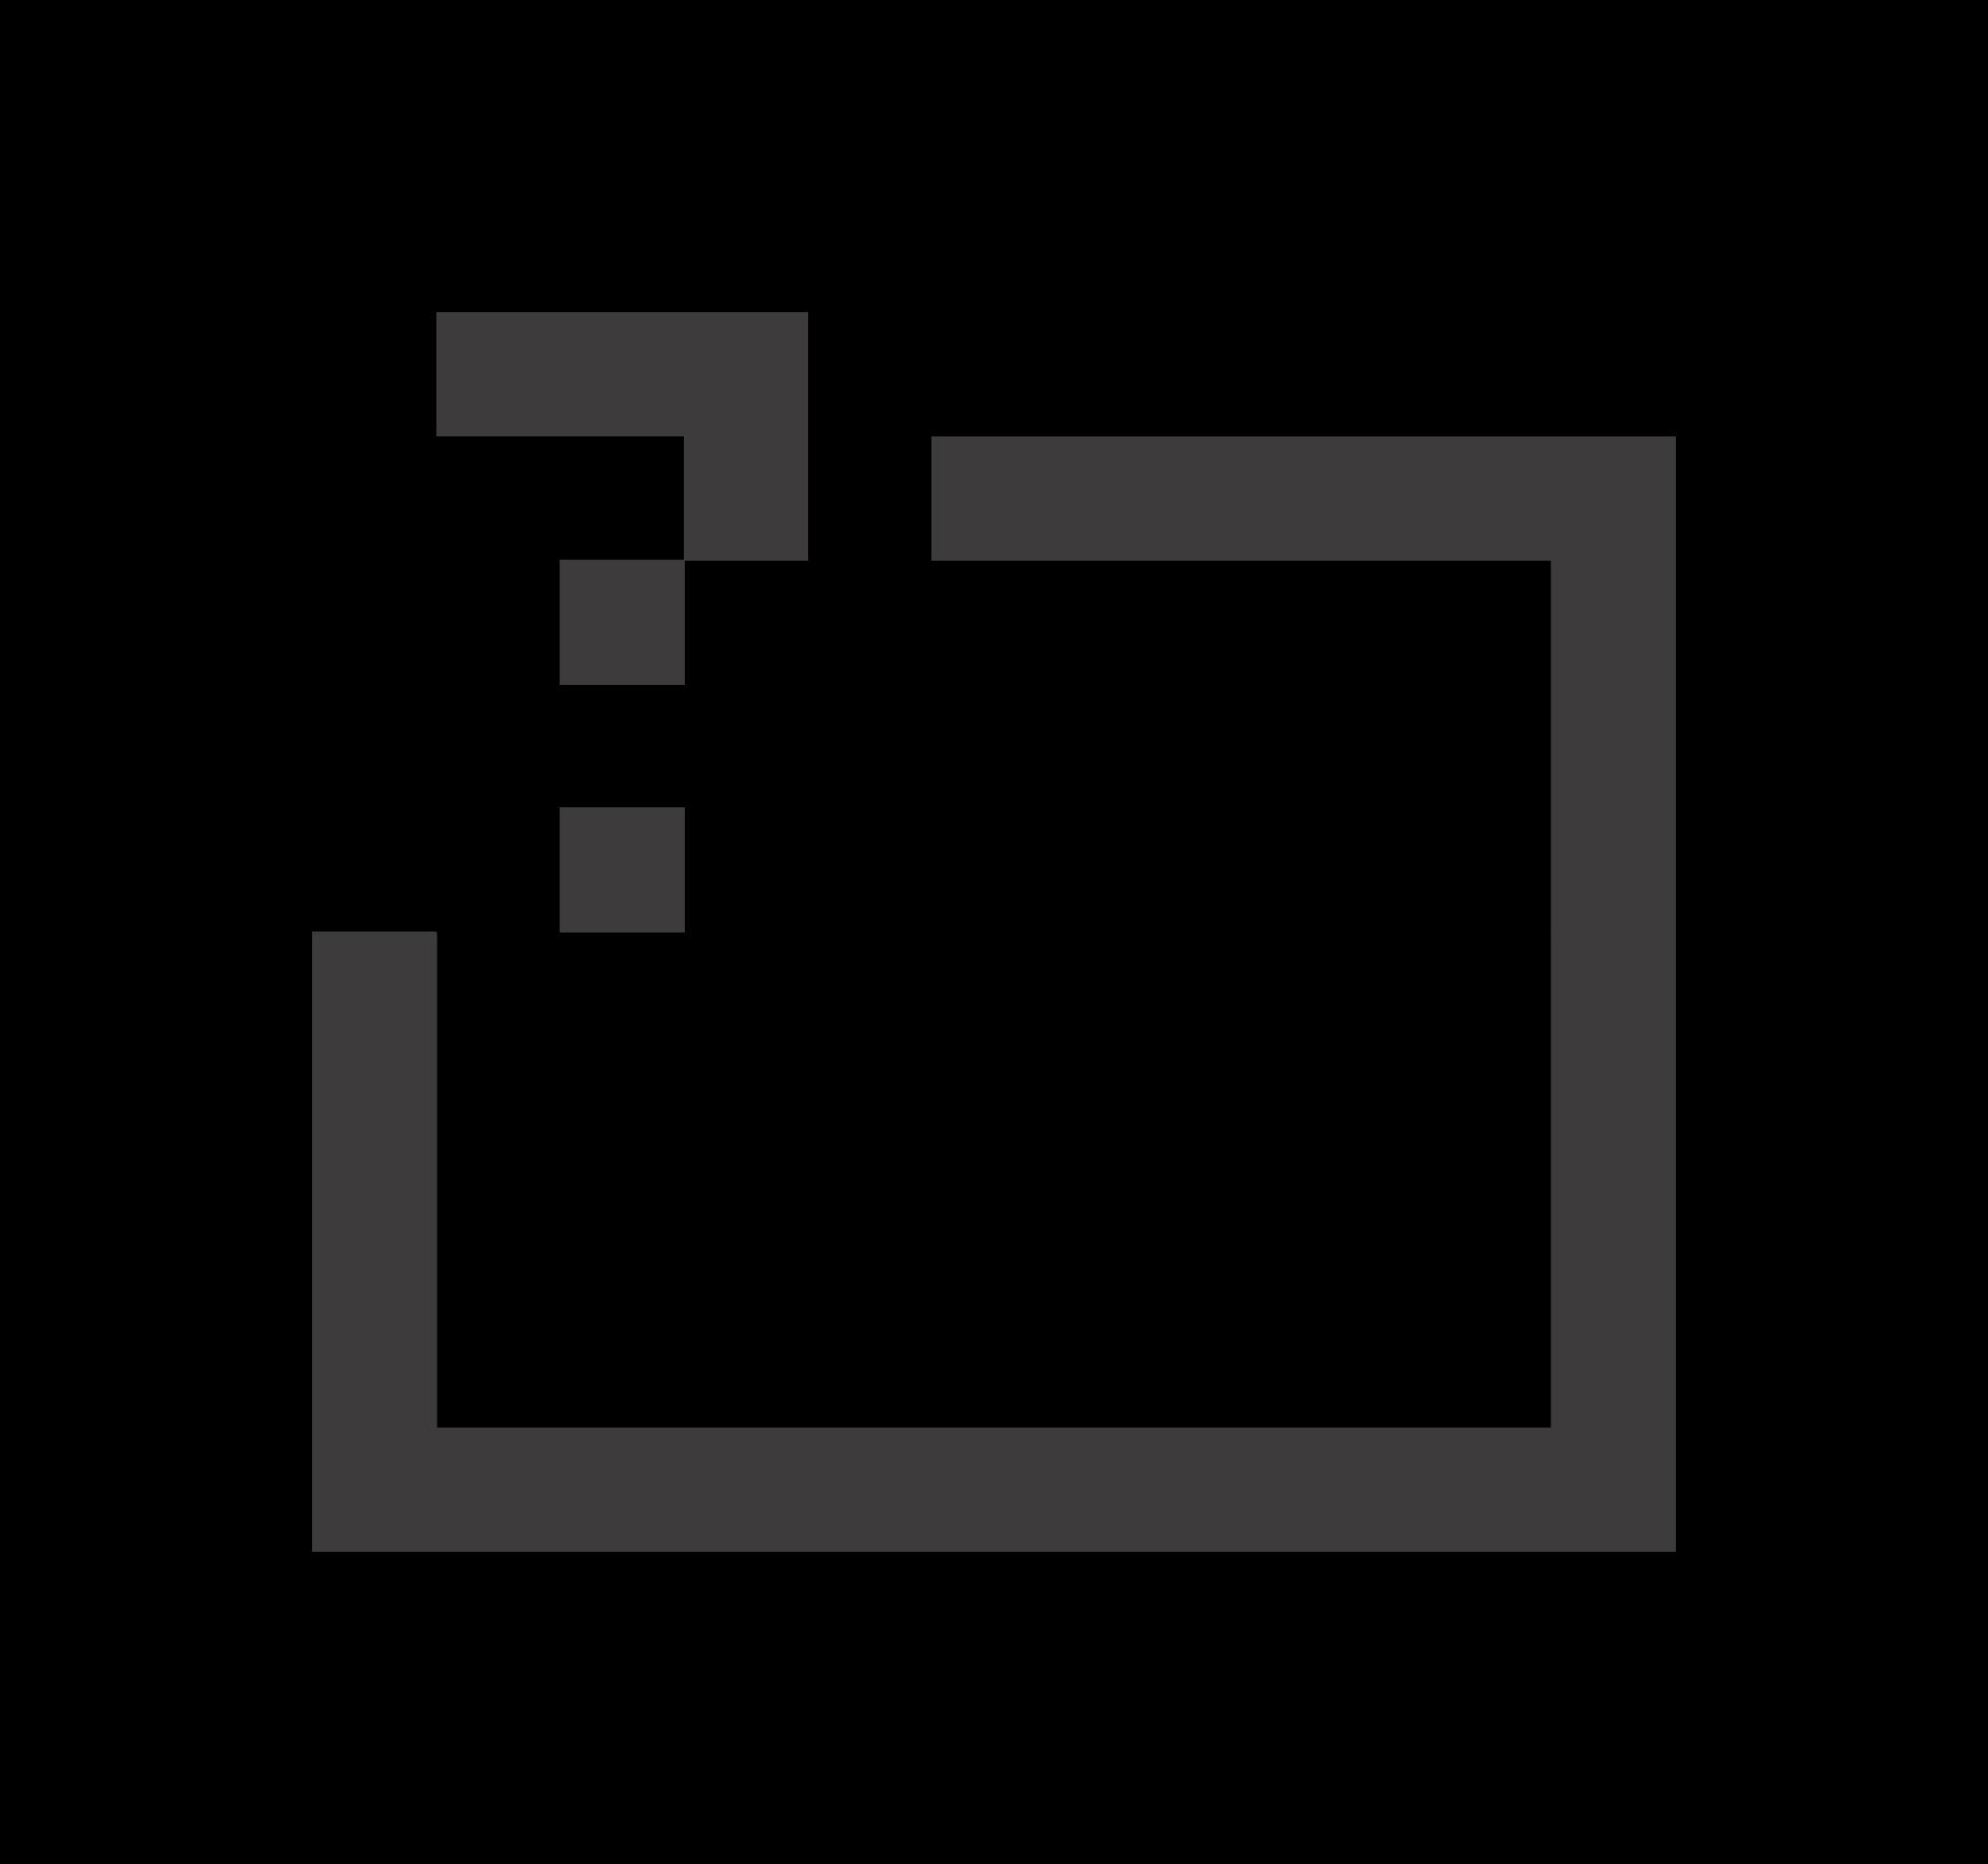 bausmedia-something-special-icon